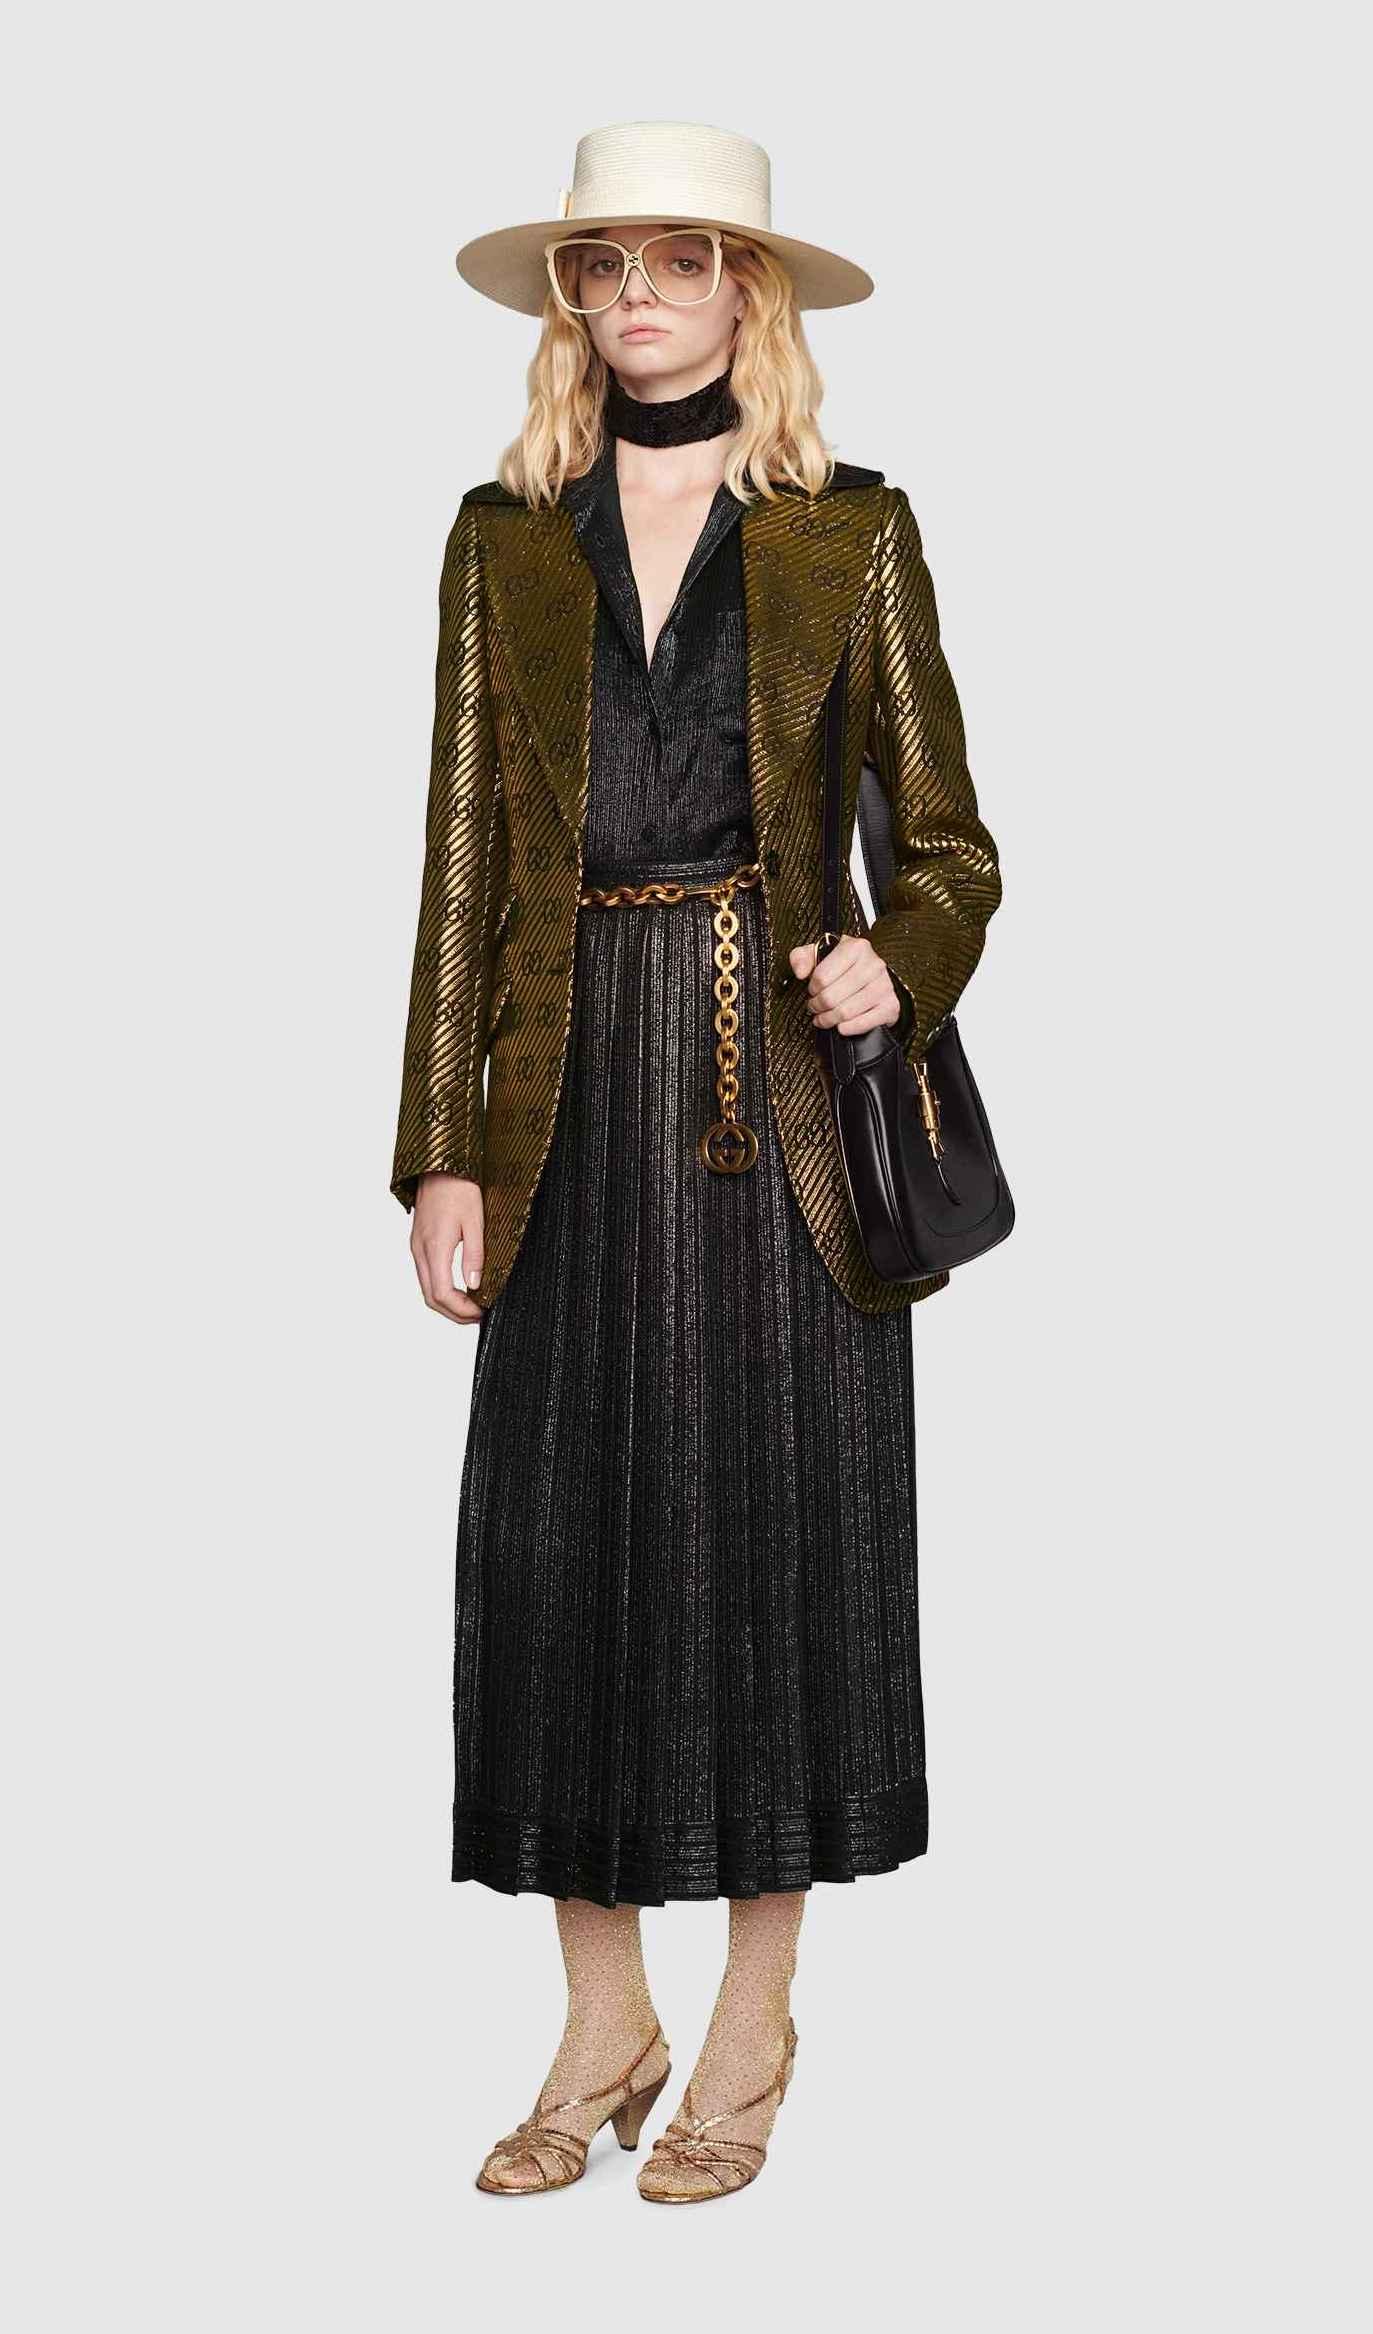 blusas de moda 2021